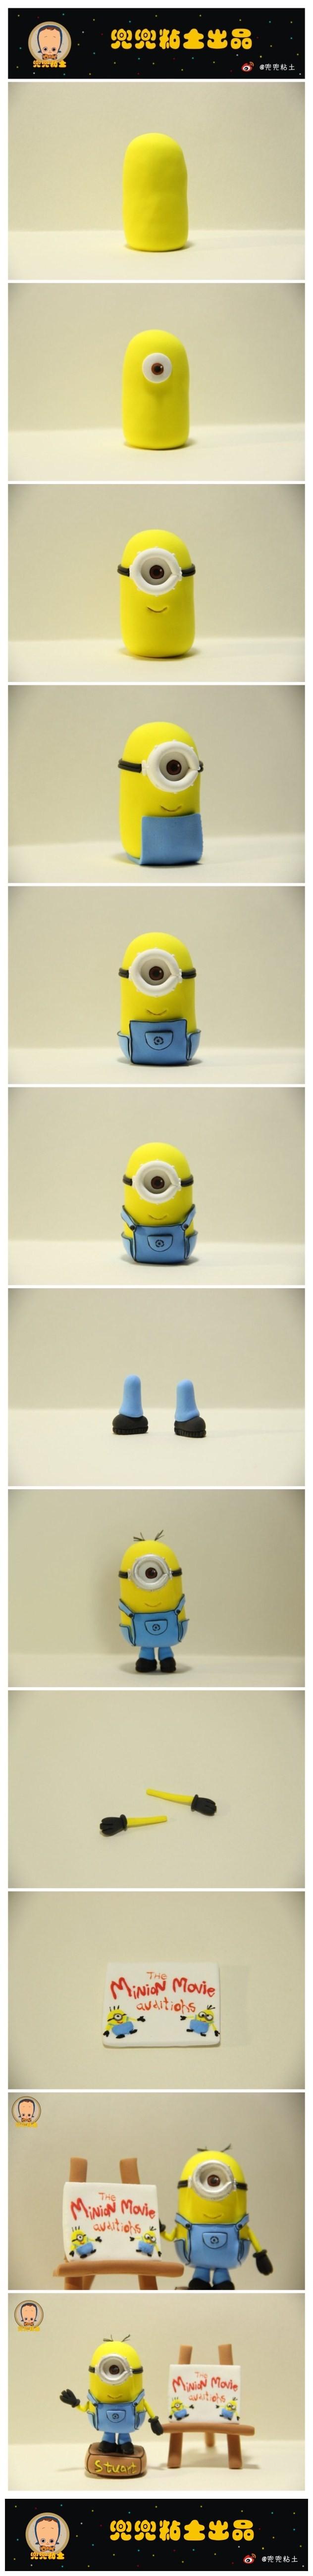 Minion. #minion #awesome #banana